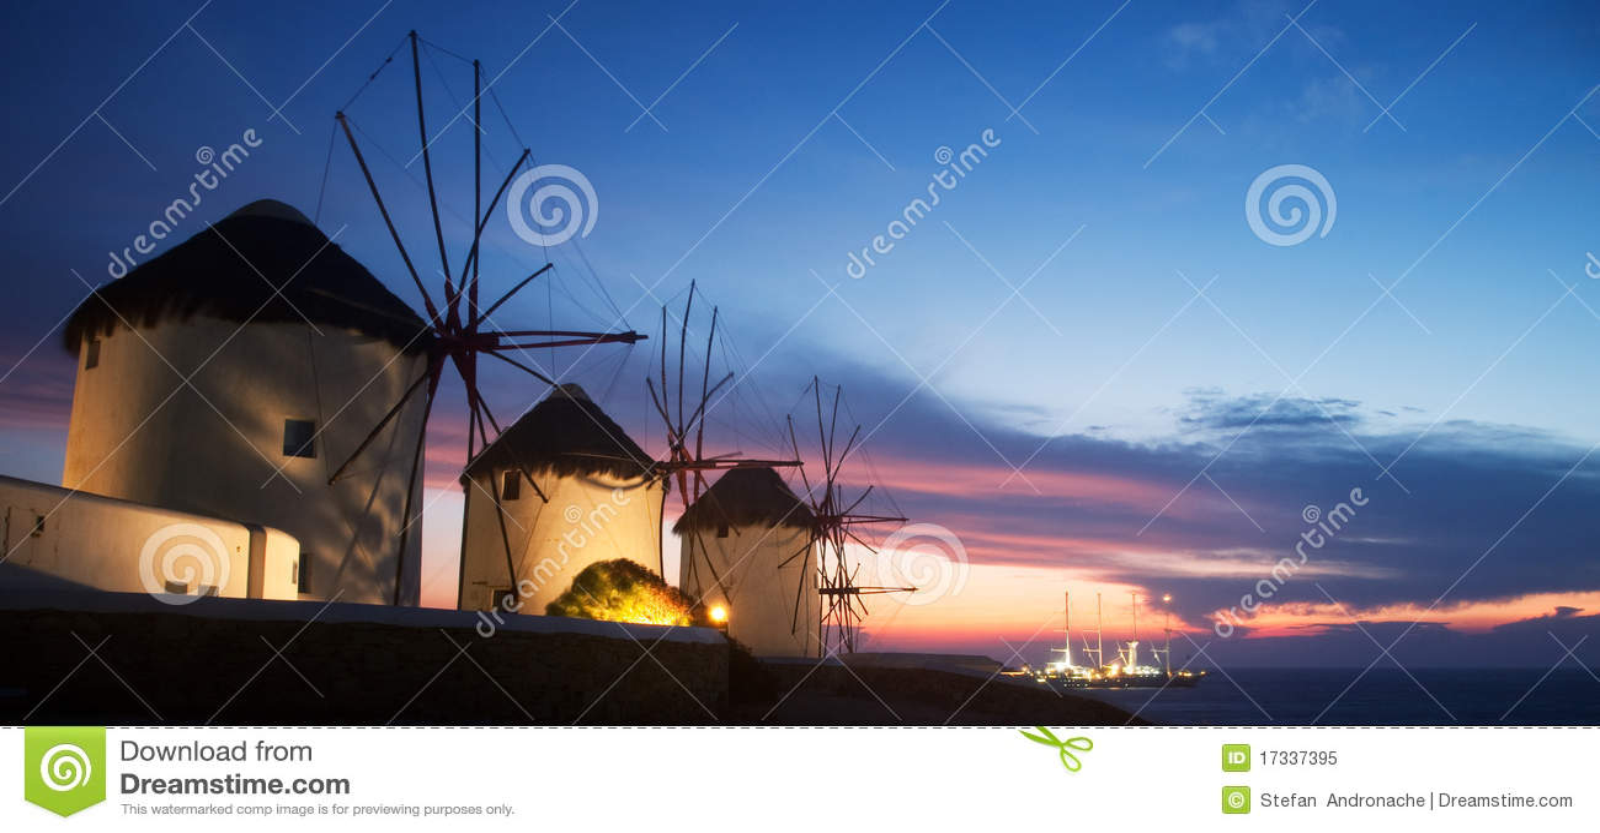 Windmills on the island of Mykonos (Greece)